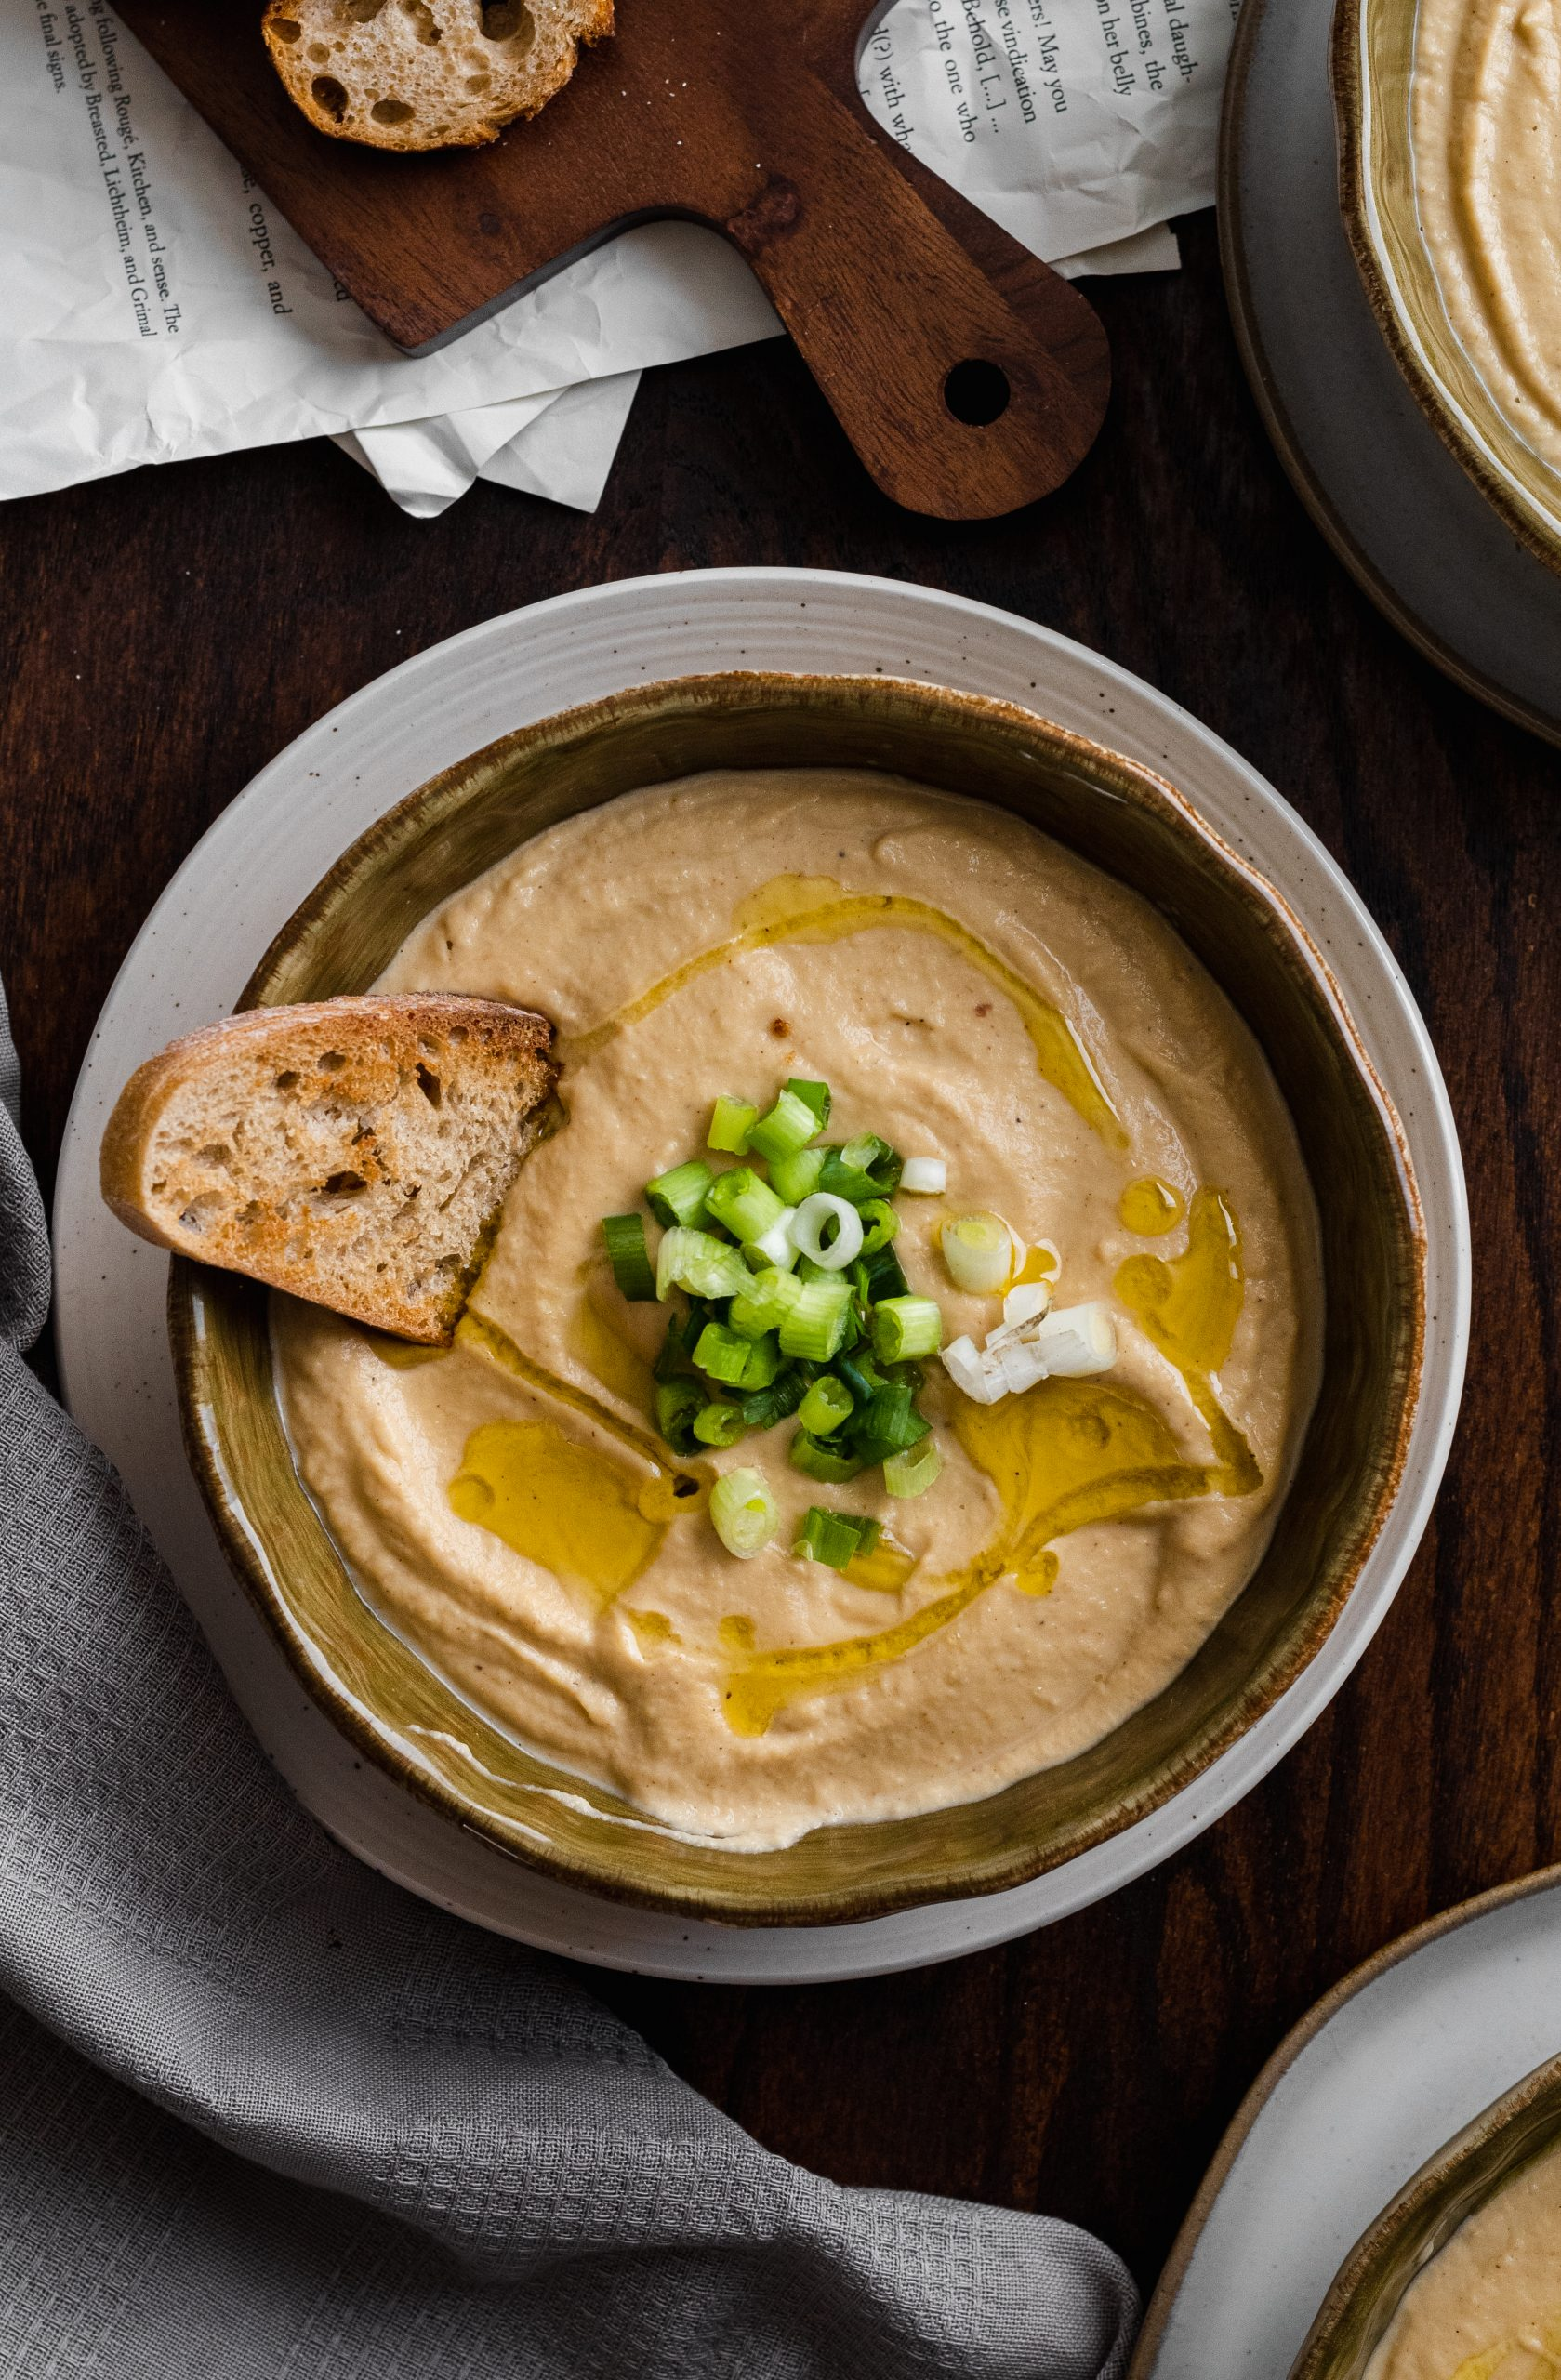 creamy roasted cauliflower soup with onions, garlic, cauliflower, and cashew cream